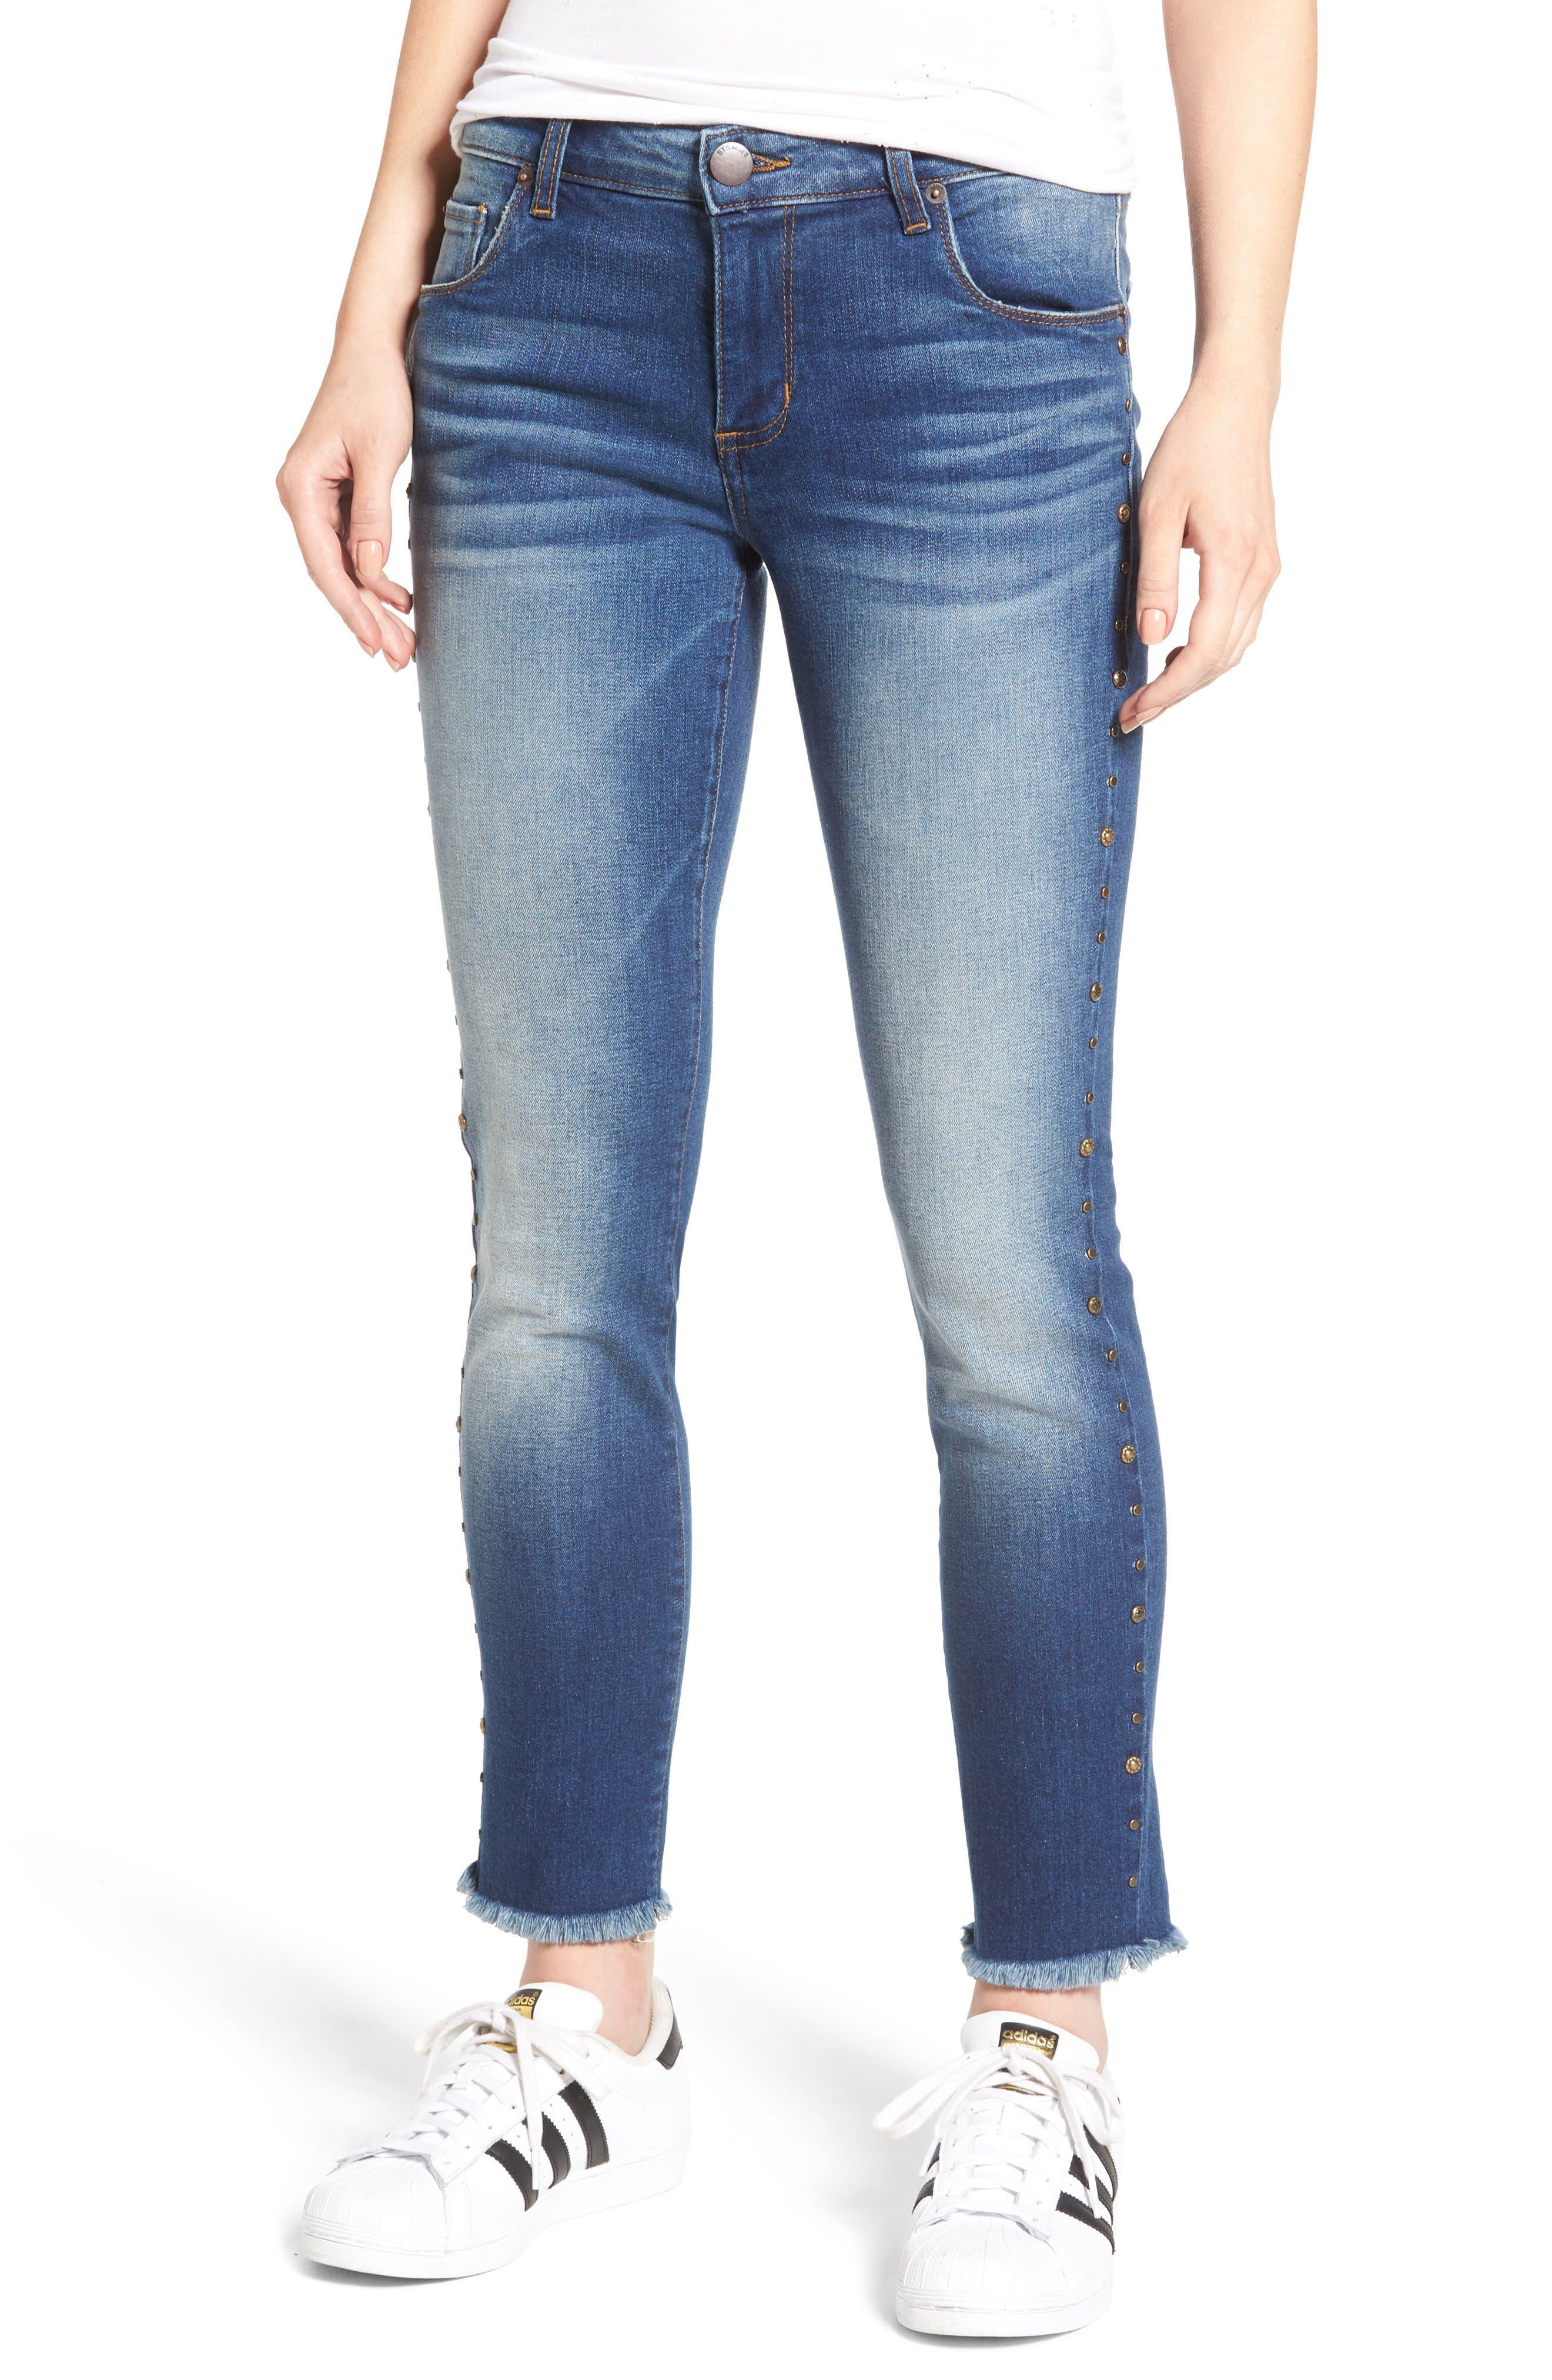 STS Blue Taylor Tomboy Studded Boyfriend Jeans (Alley)